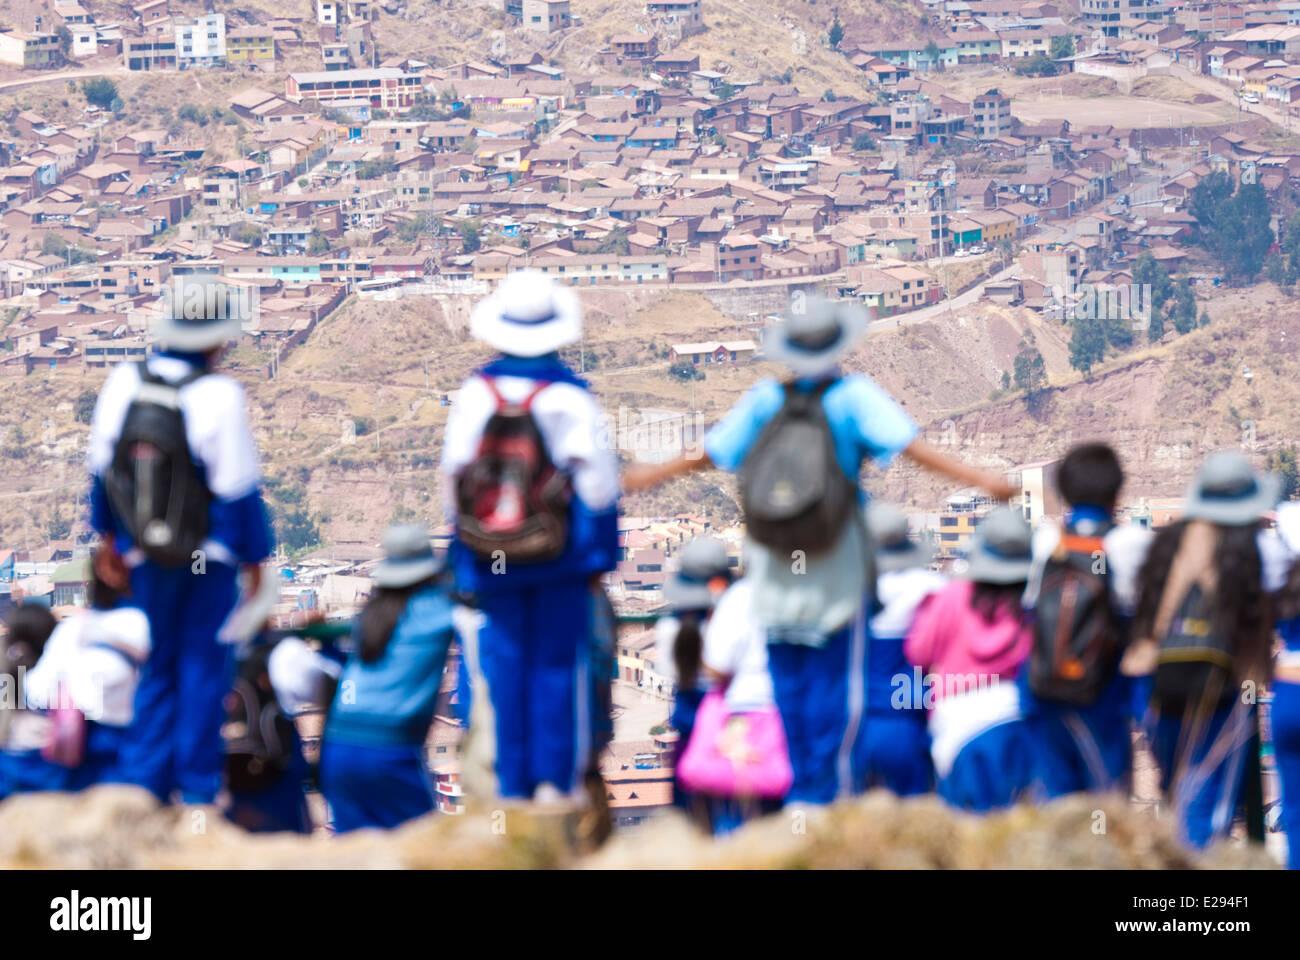 Perù,Cuzco,Urban scenes - Stock Image